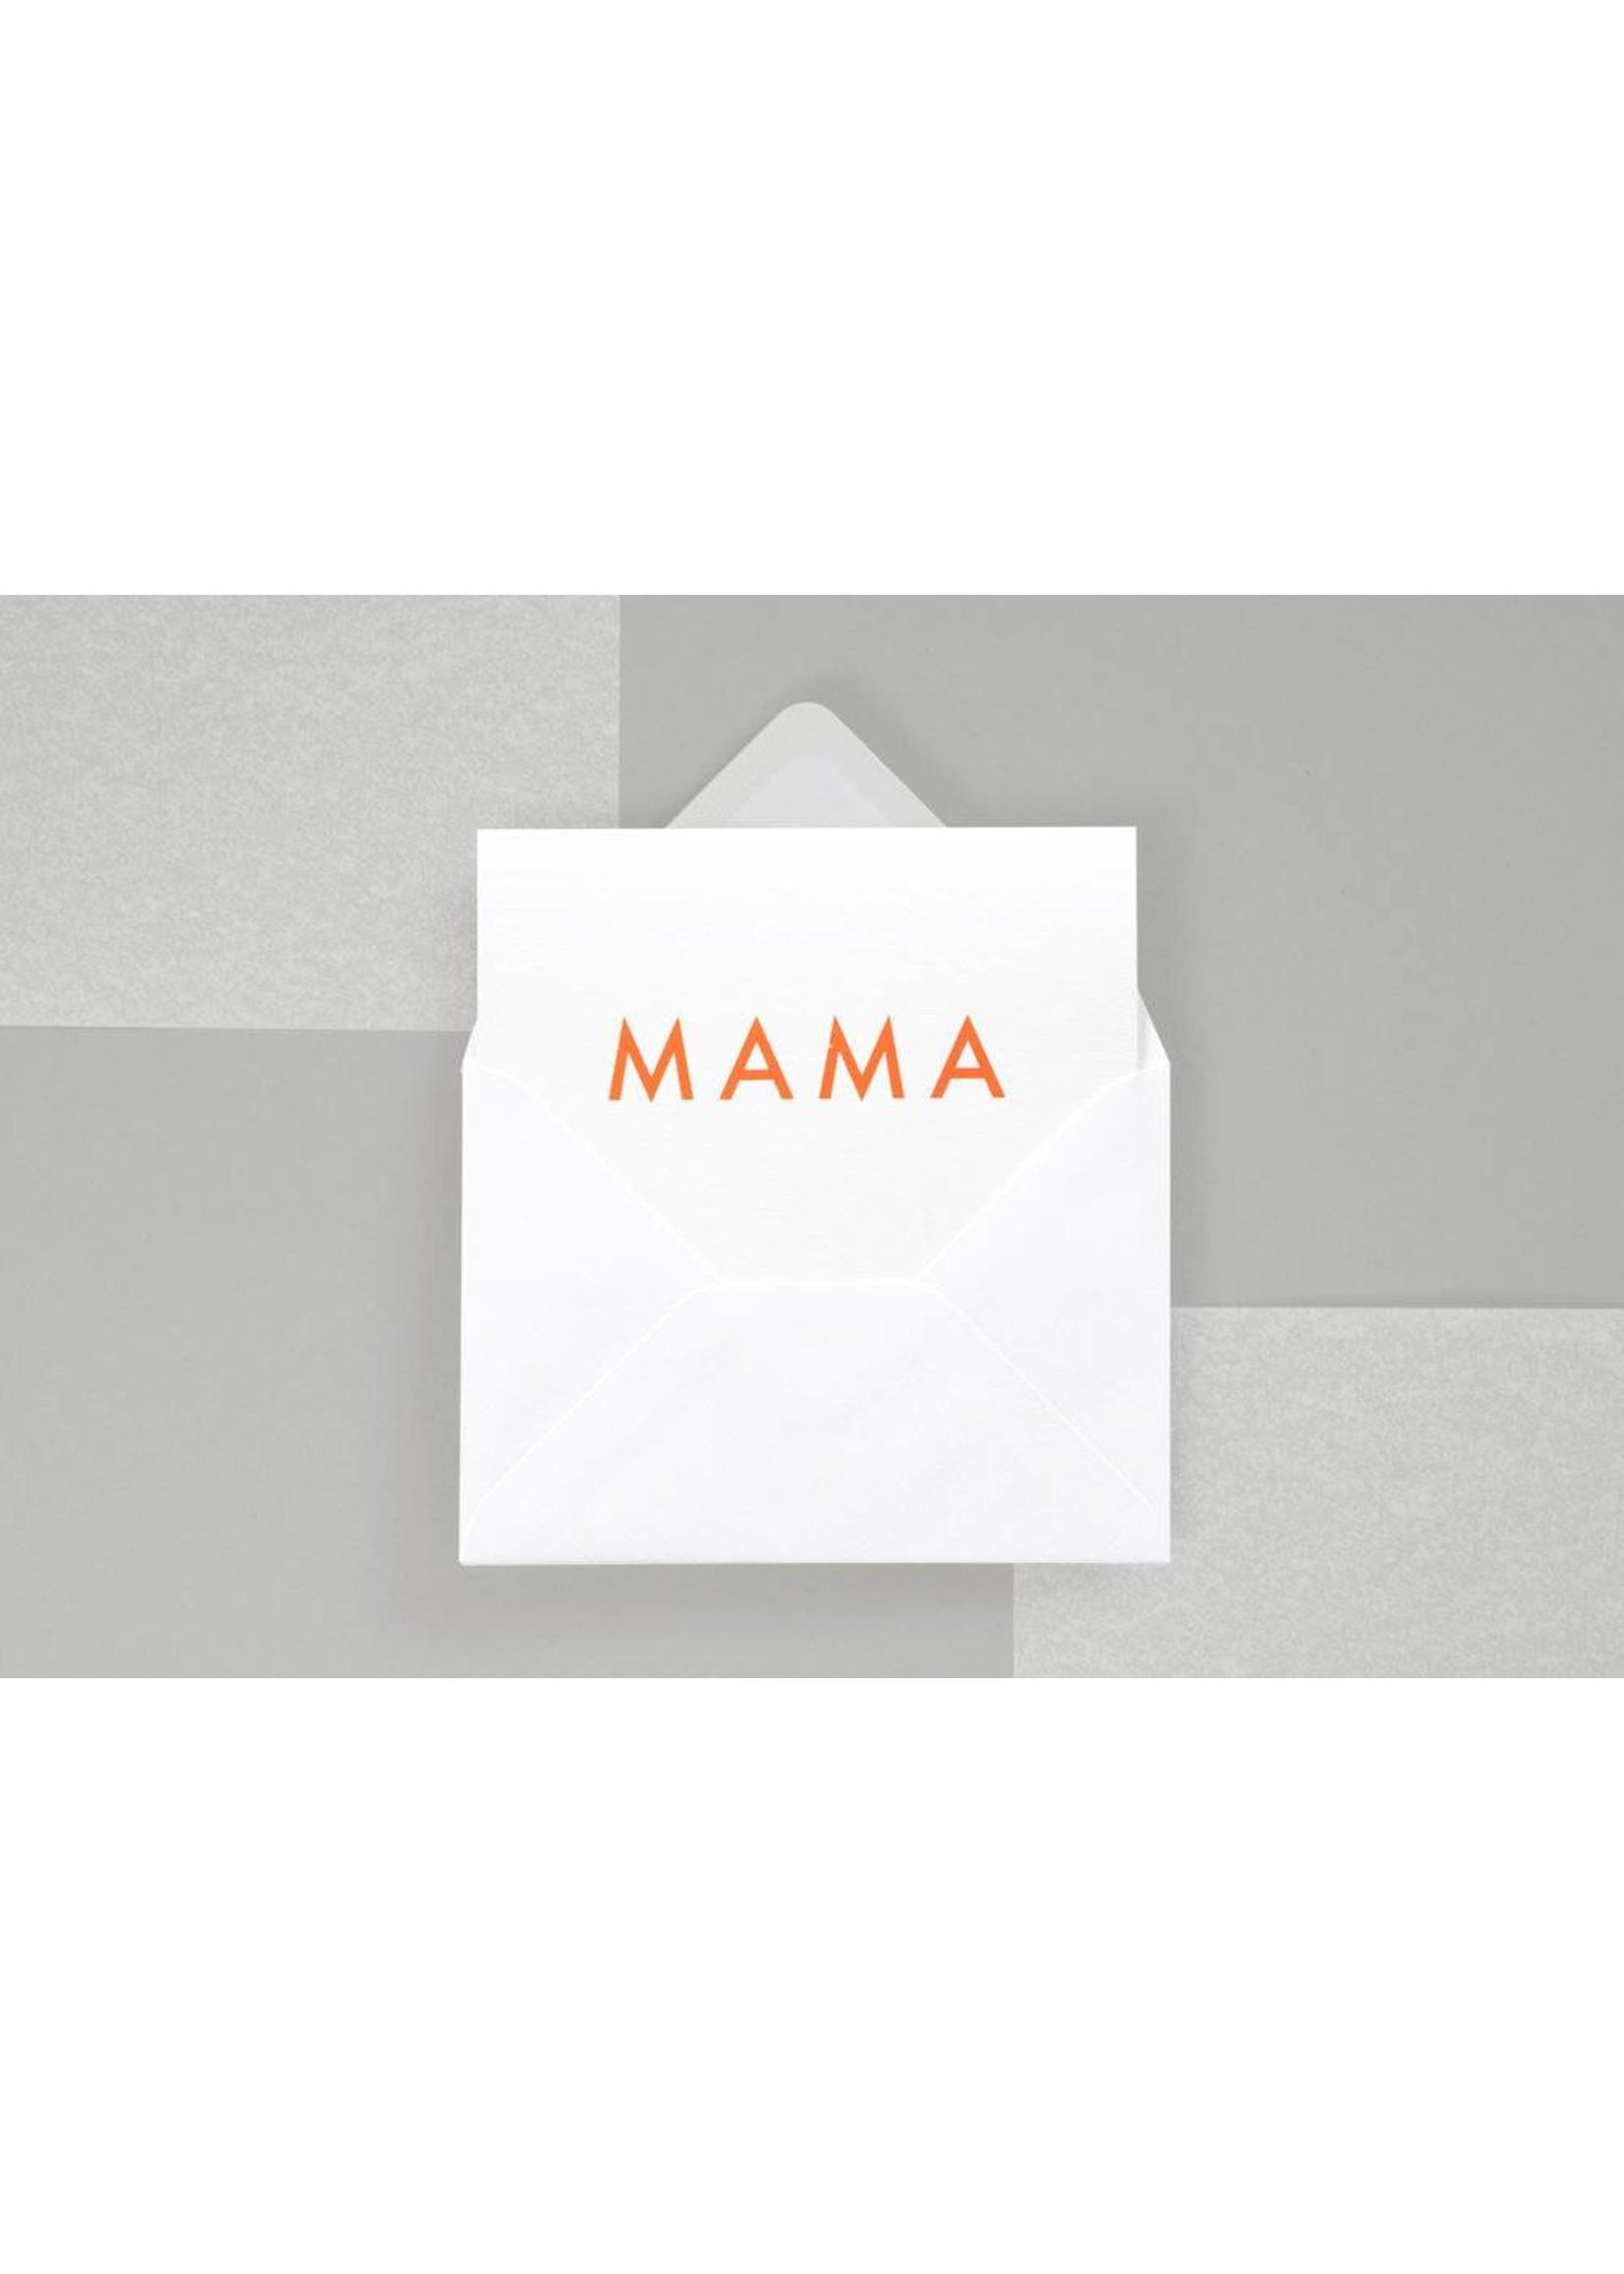 Ola Ola Foil Blocked Fluorescent Cards: Mama